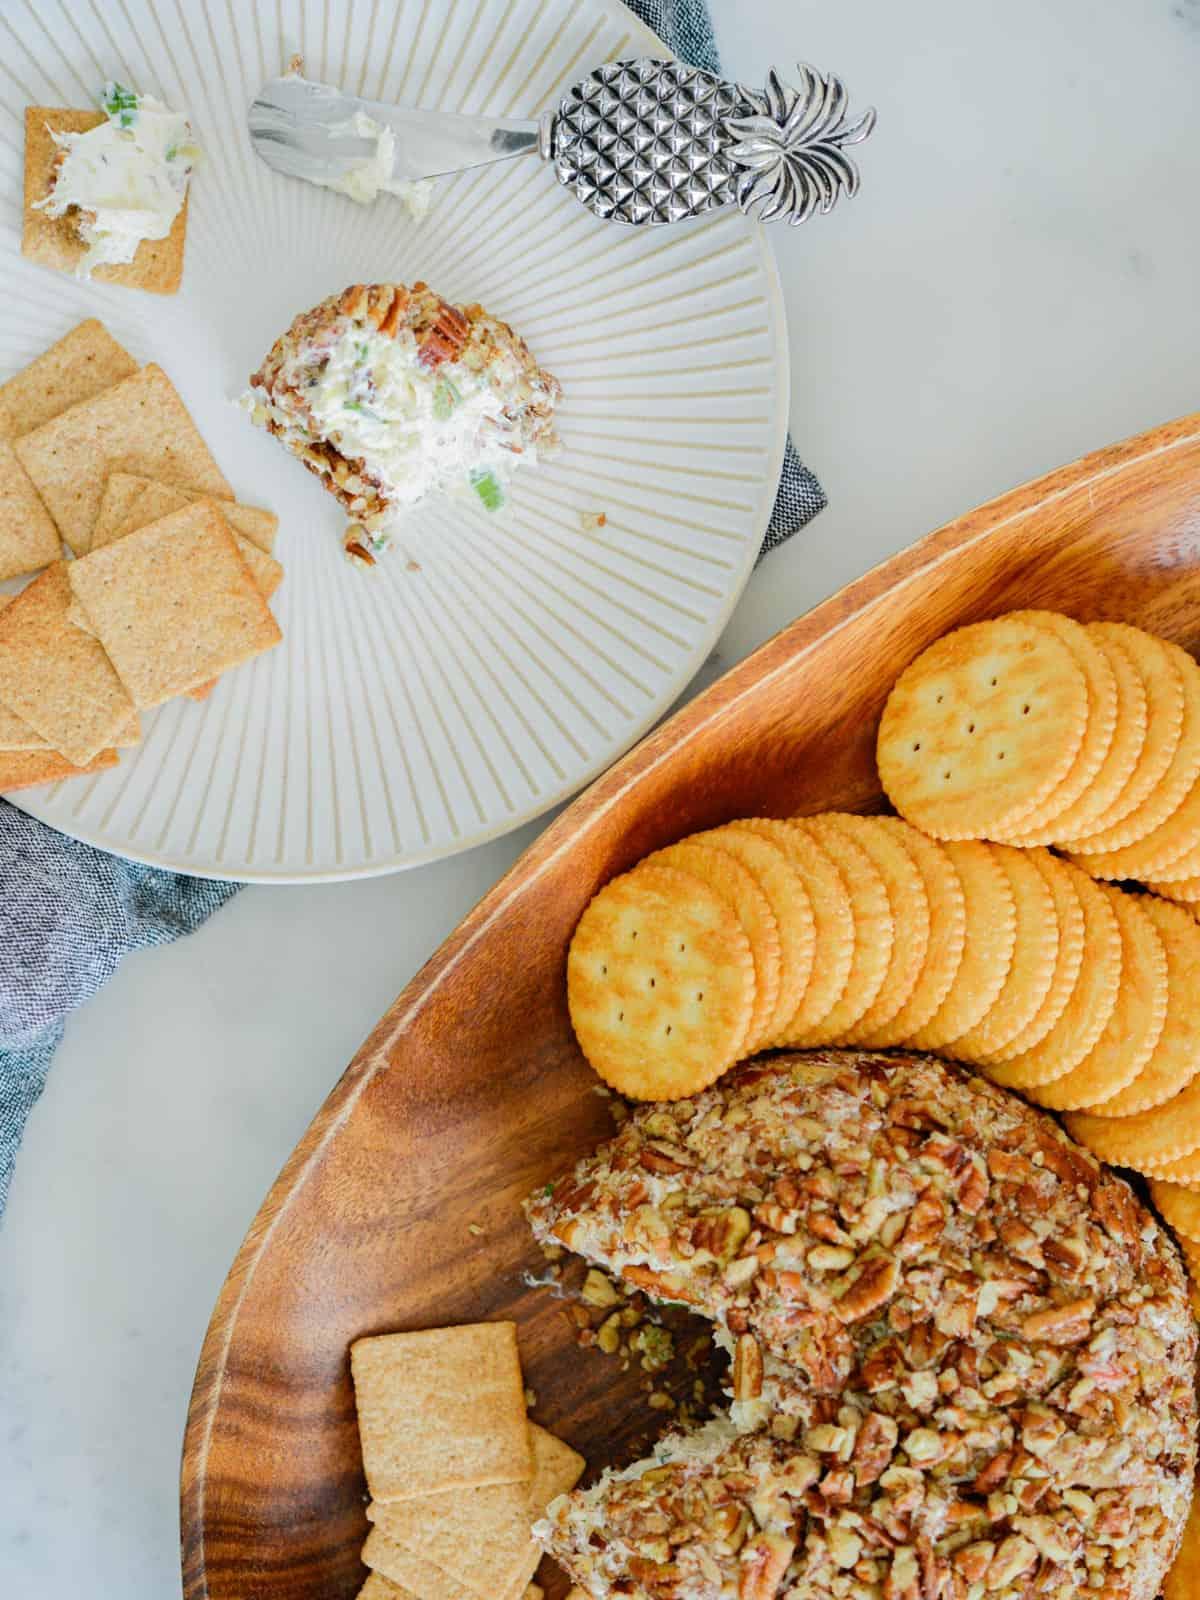 platter of cheeseball and crackers